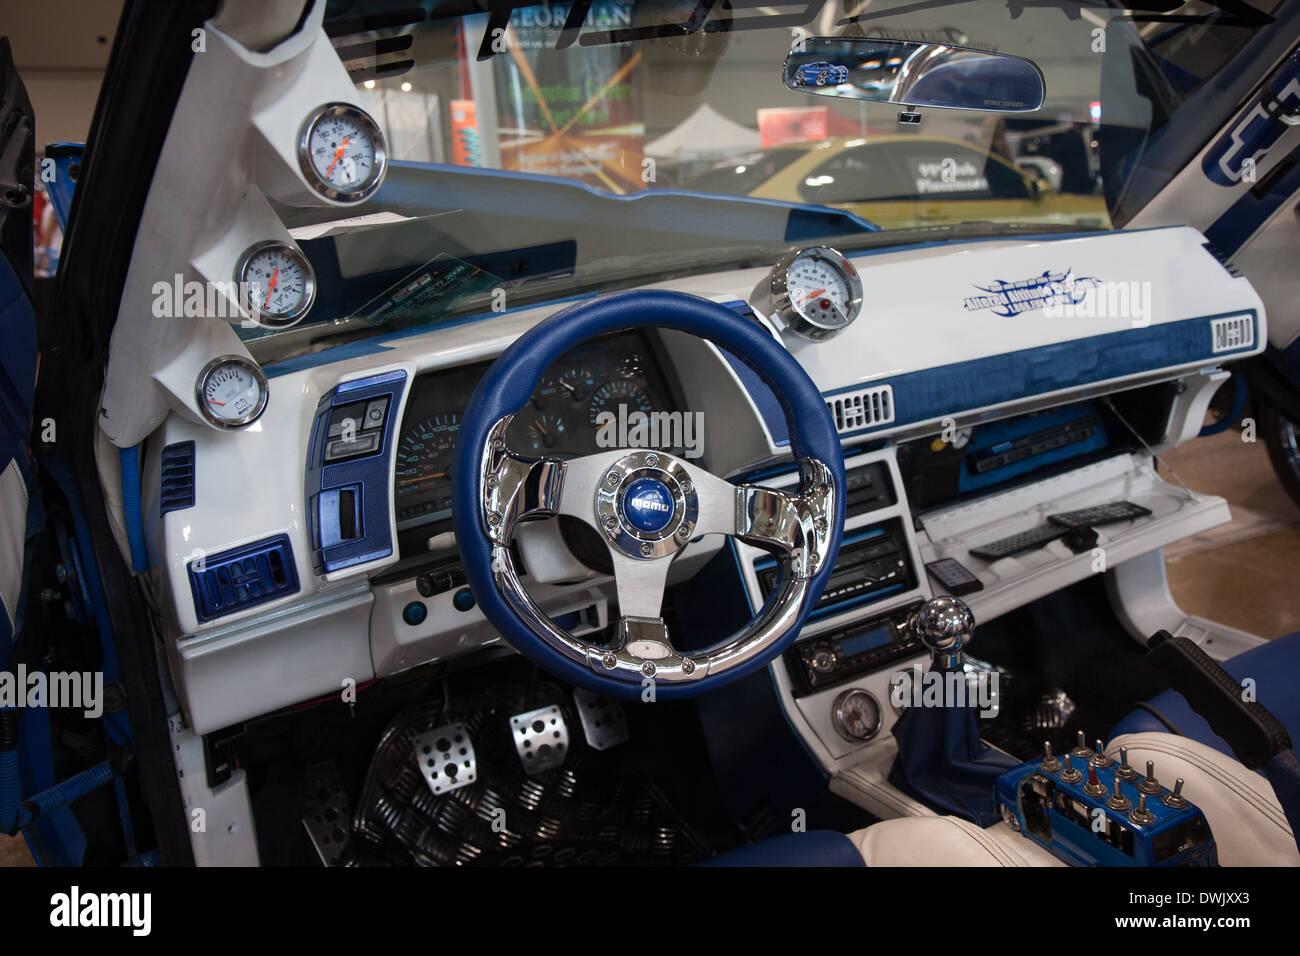 Custom Car Interior Stock Photos & Custom Car Interior Stock ...